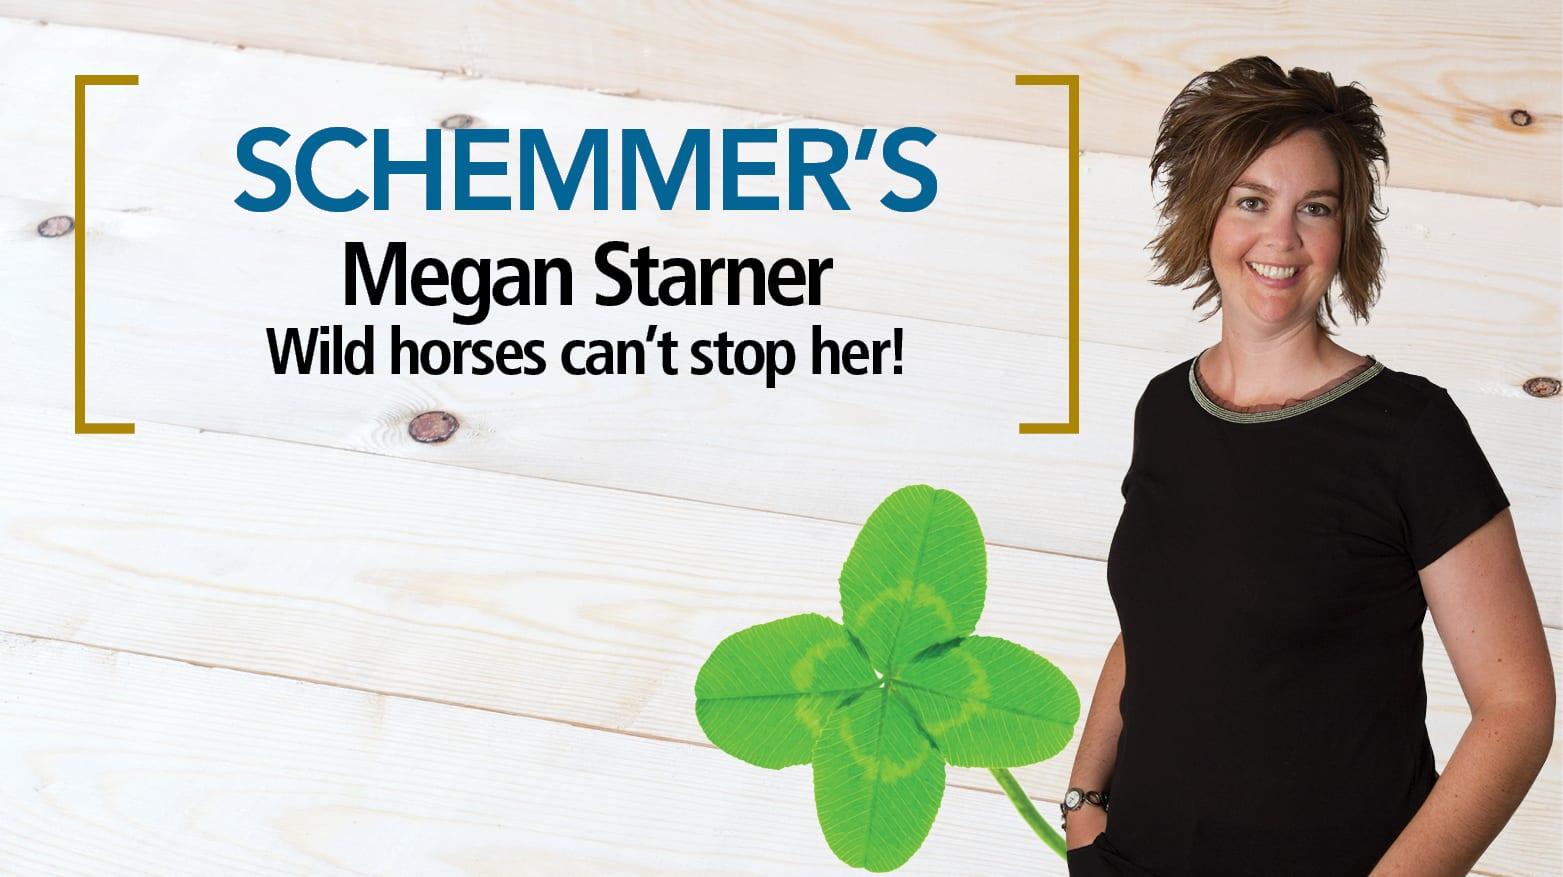 Schemmer's Megan Starner Receives Heart of 4-H Award